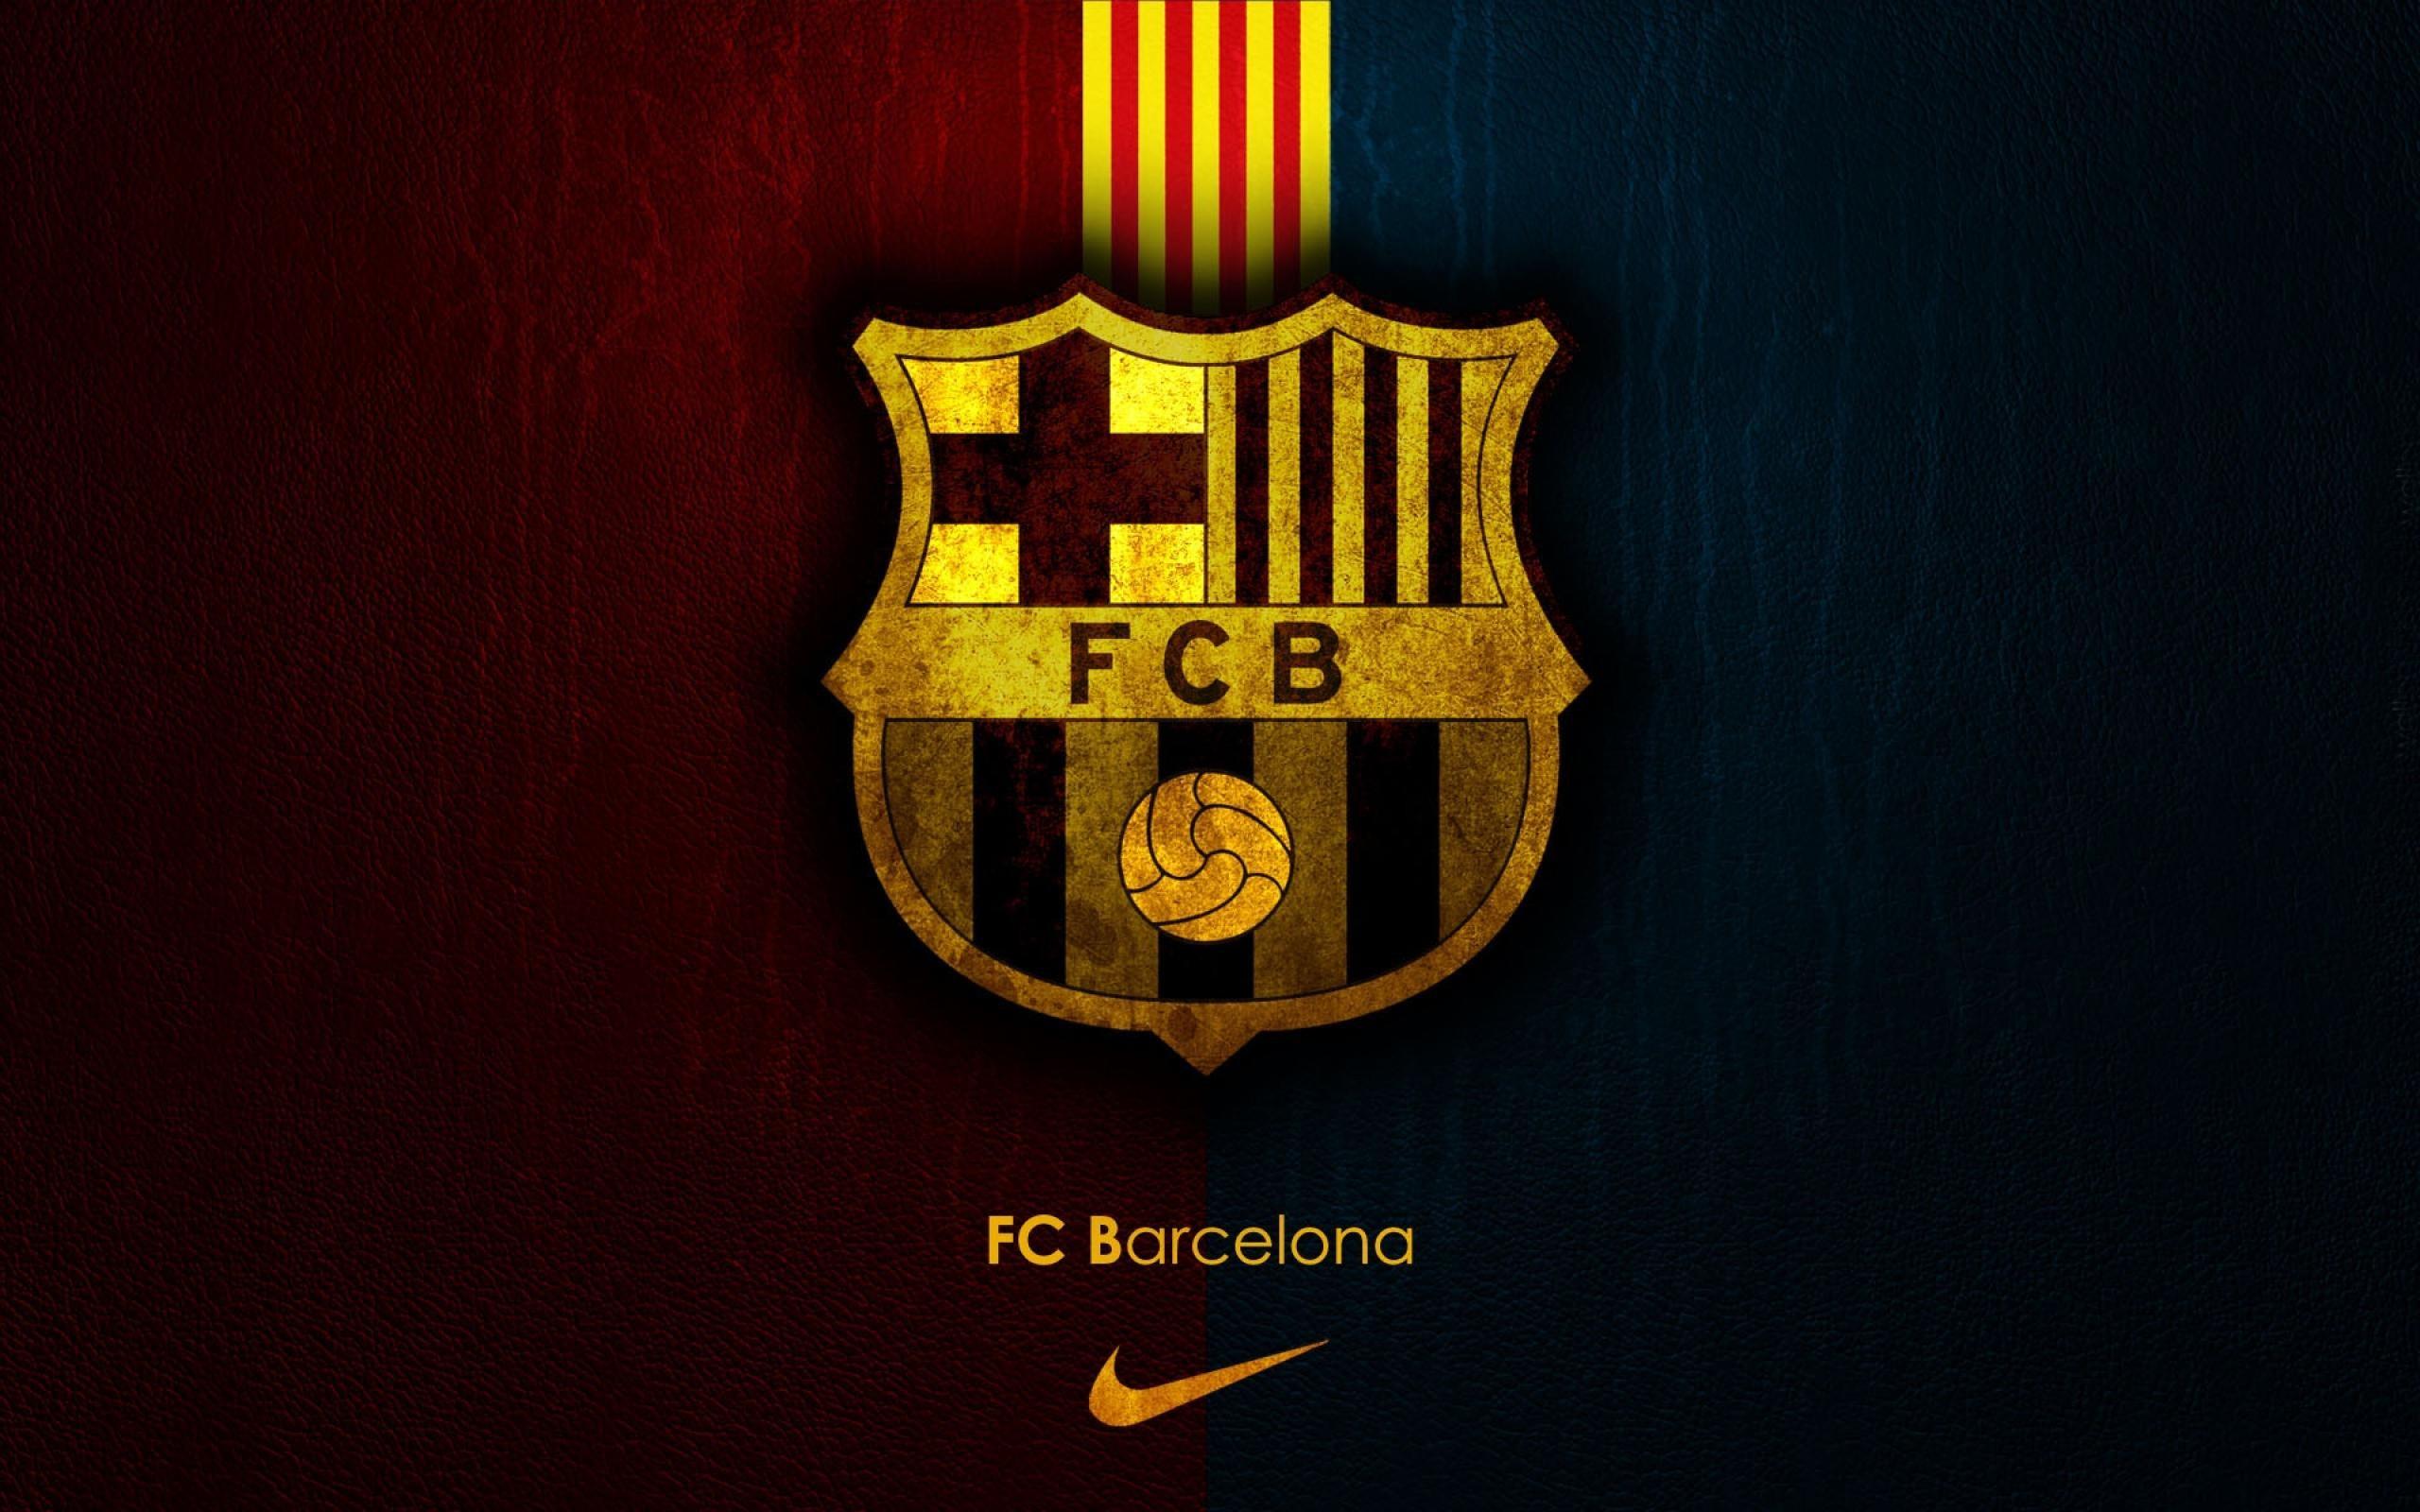 fc barcelona logo wallpaper 183��